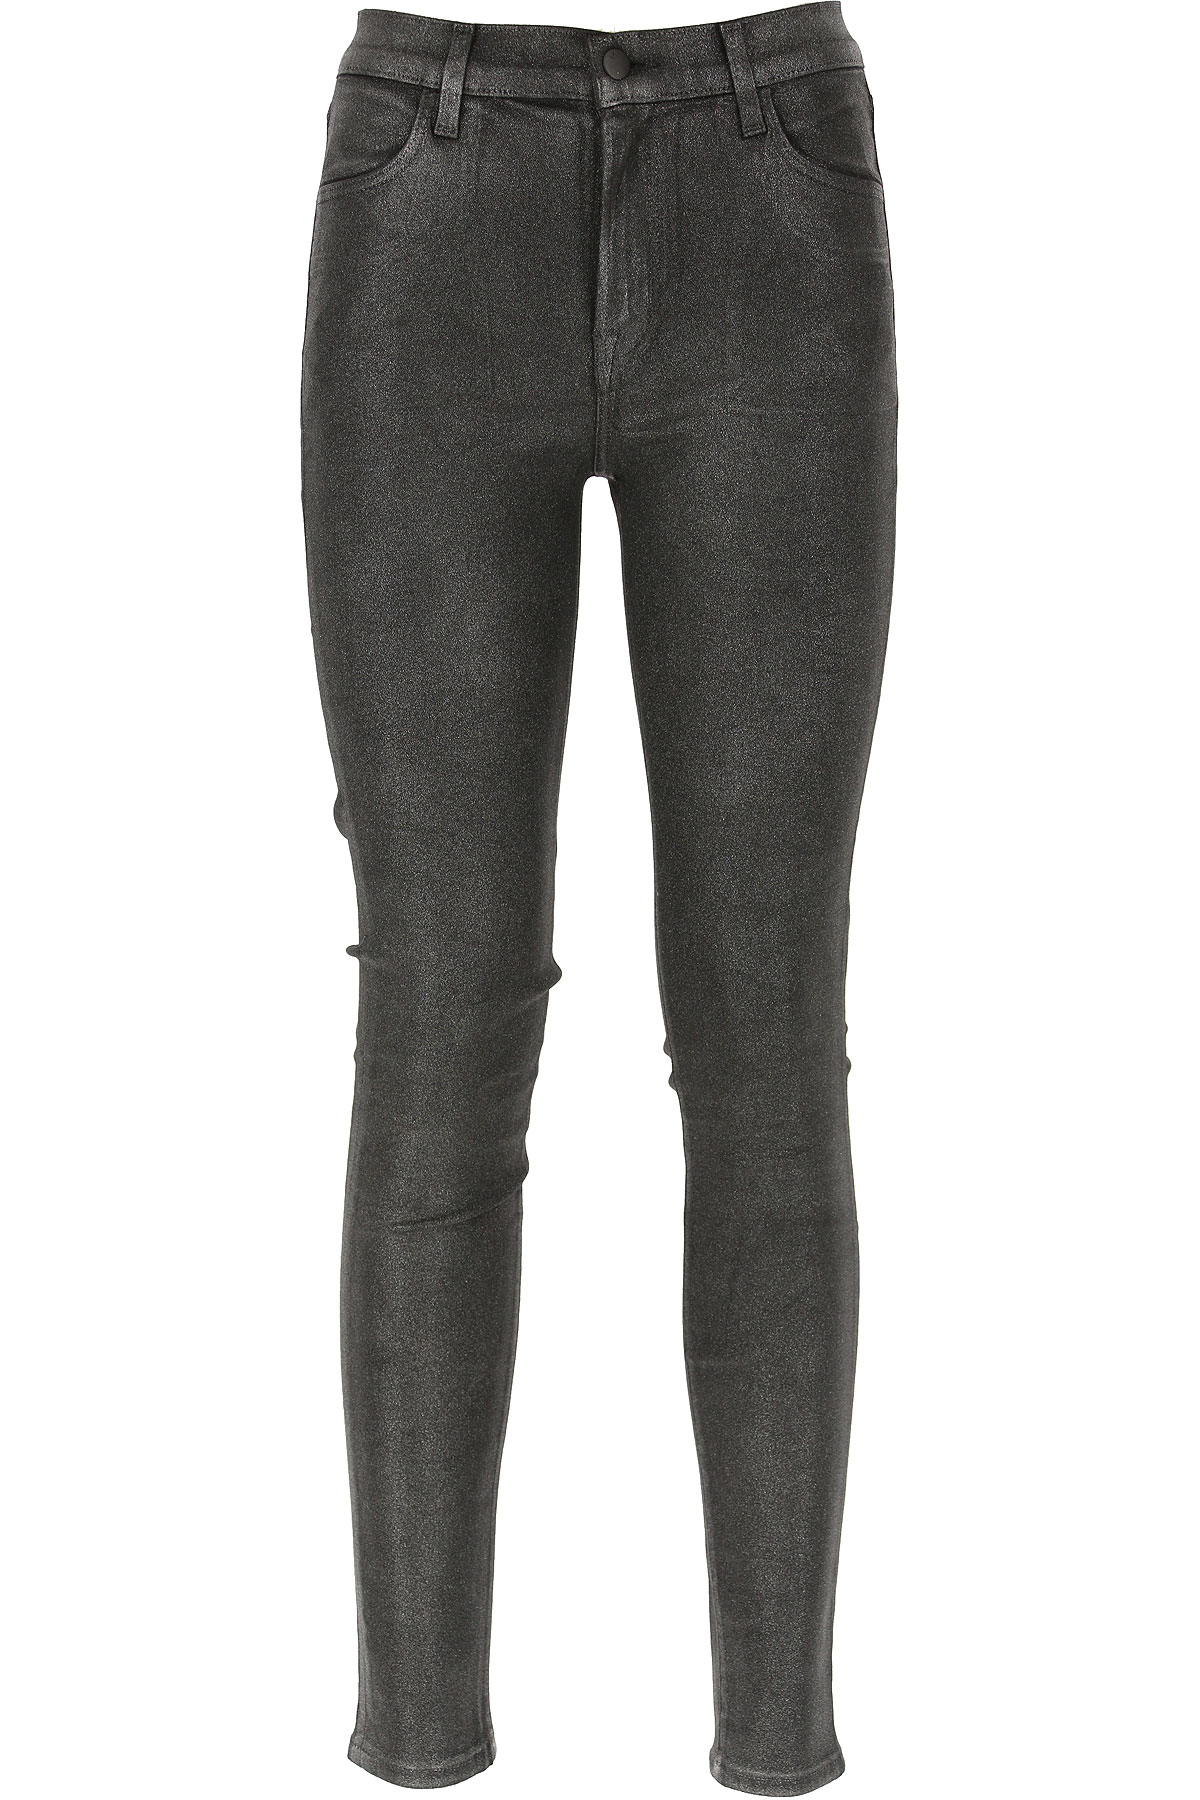 J Brand Pants for Women On Sale, Dark Silver, Cotton, 2019, 26 27 28 29